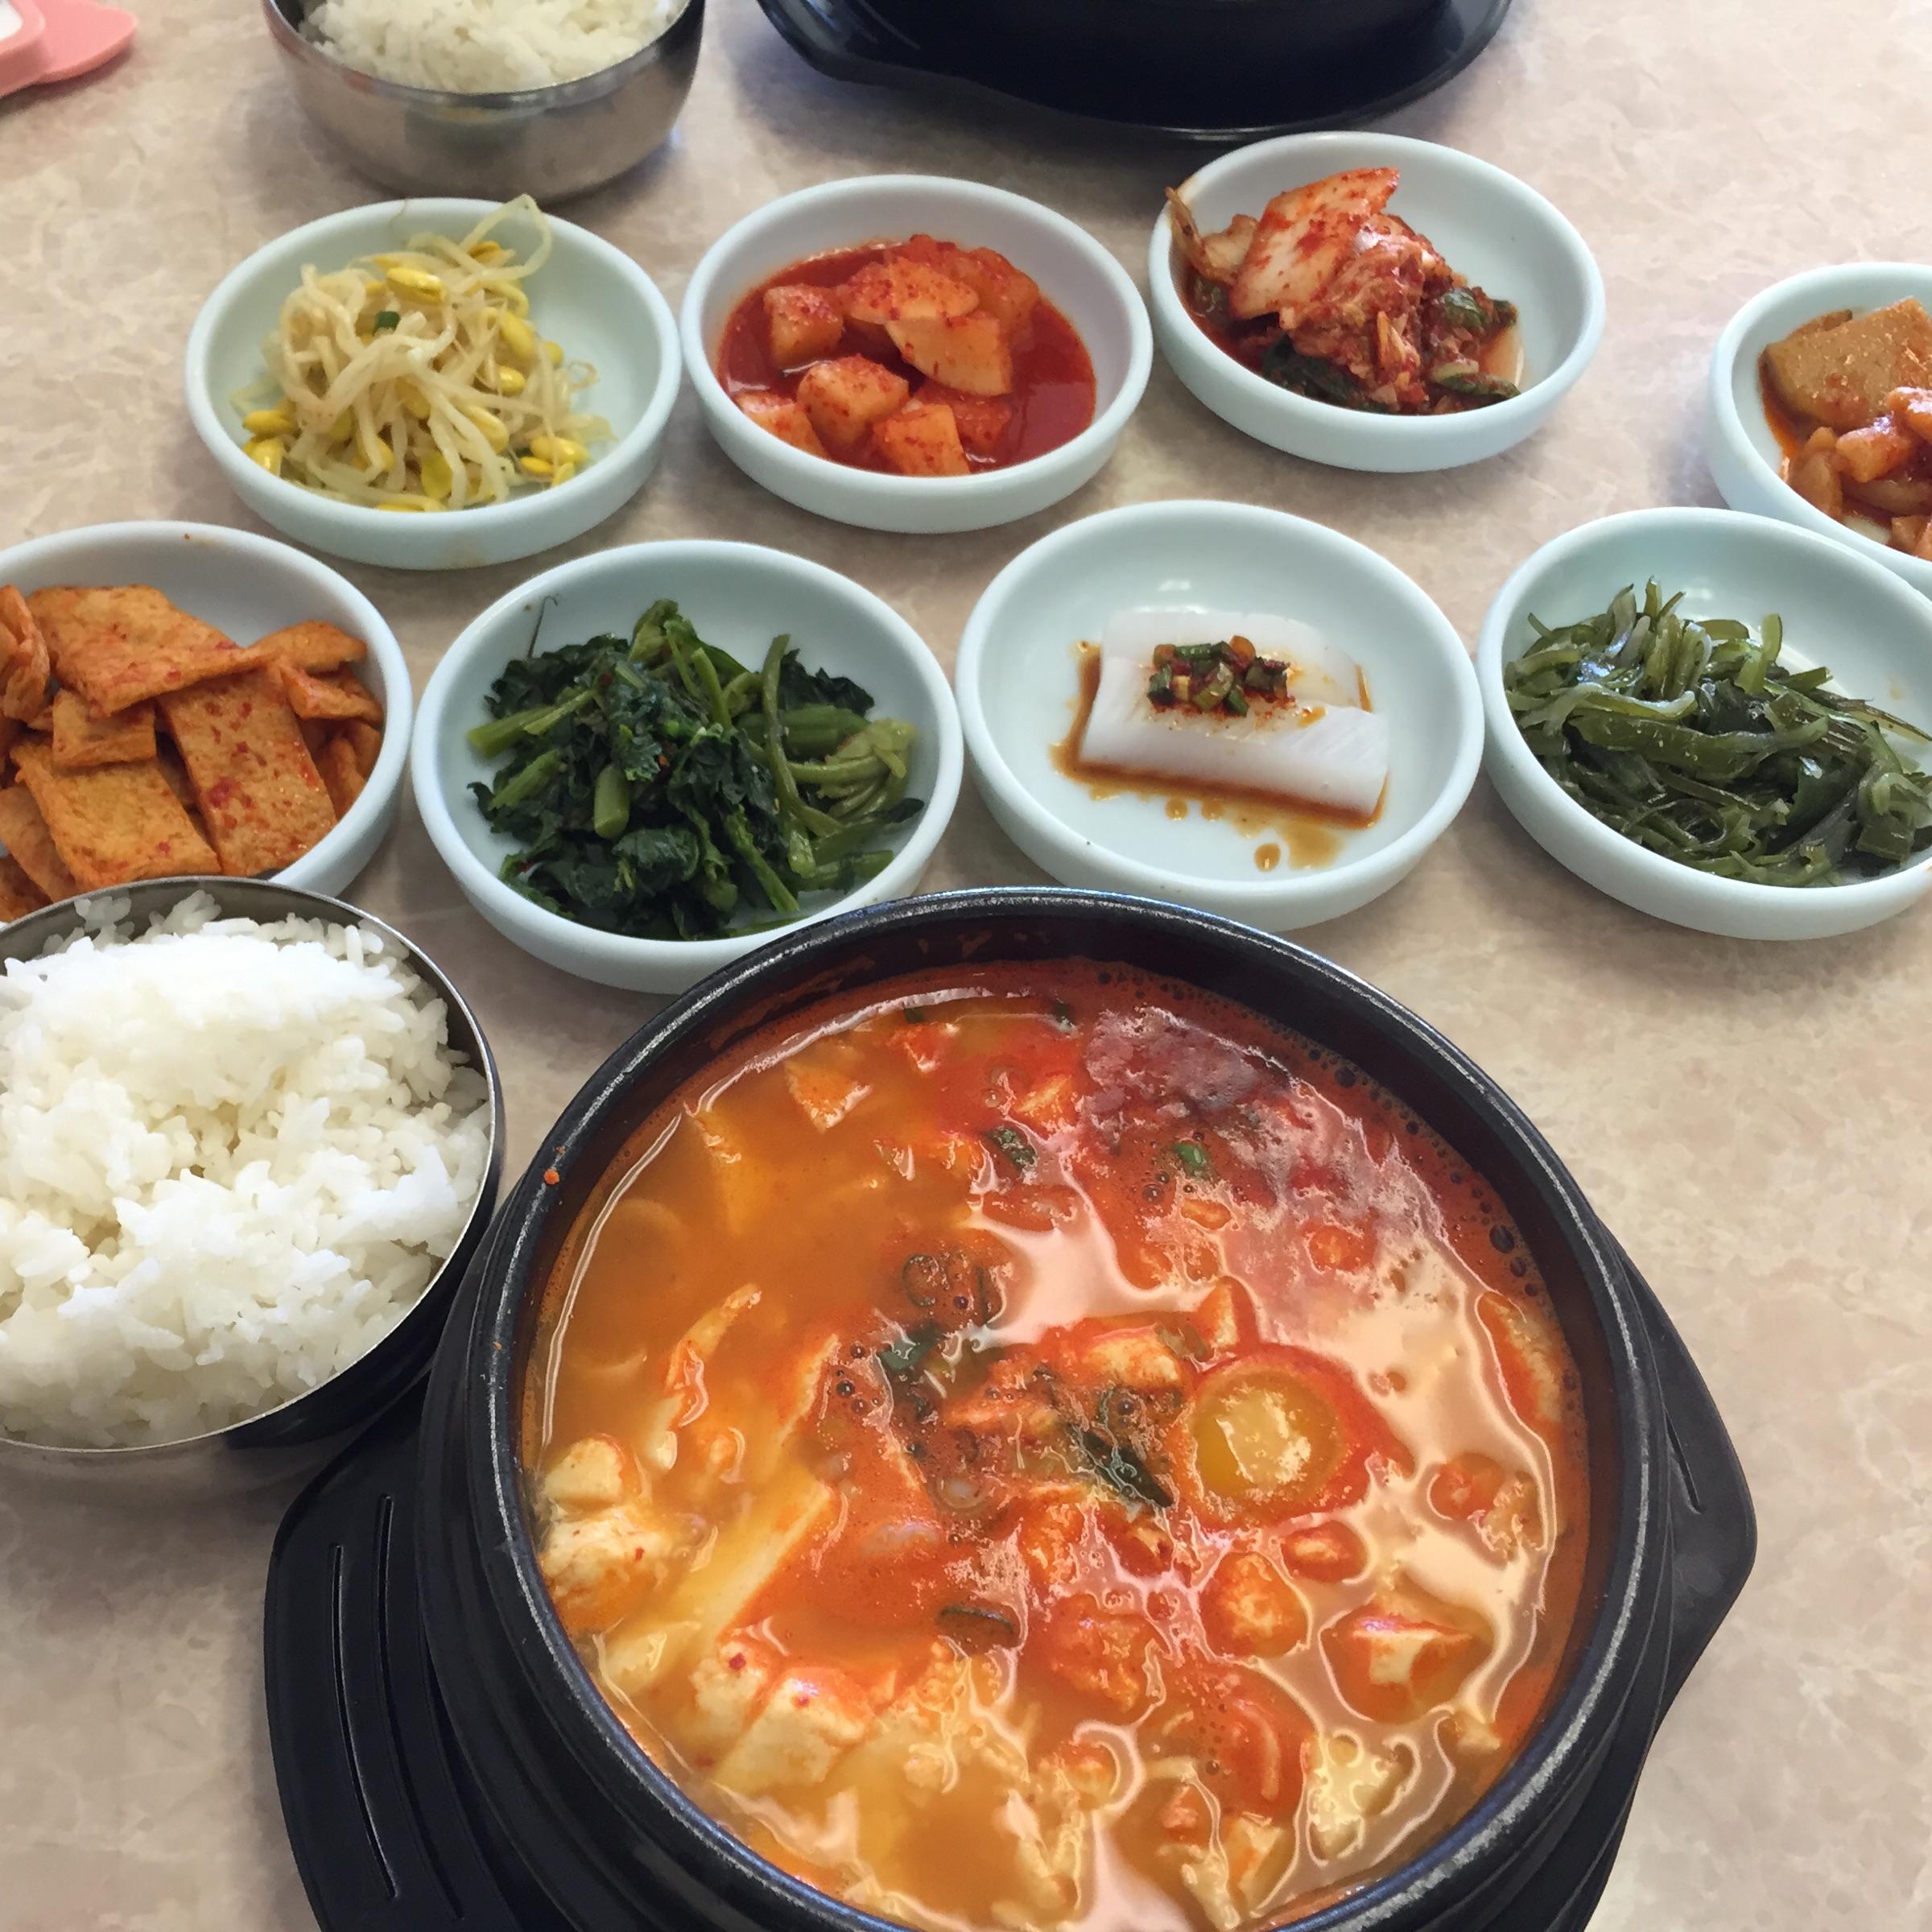 Jin mi korean cuisine menu plano tx foodspotting for Ajk chinese cuisine